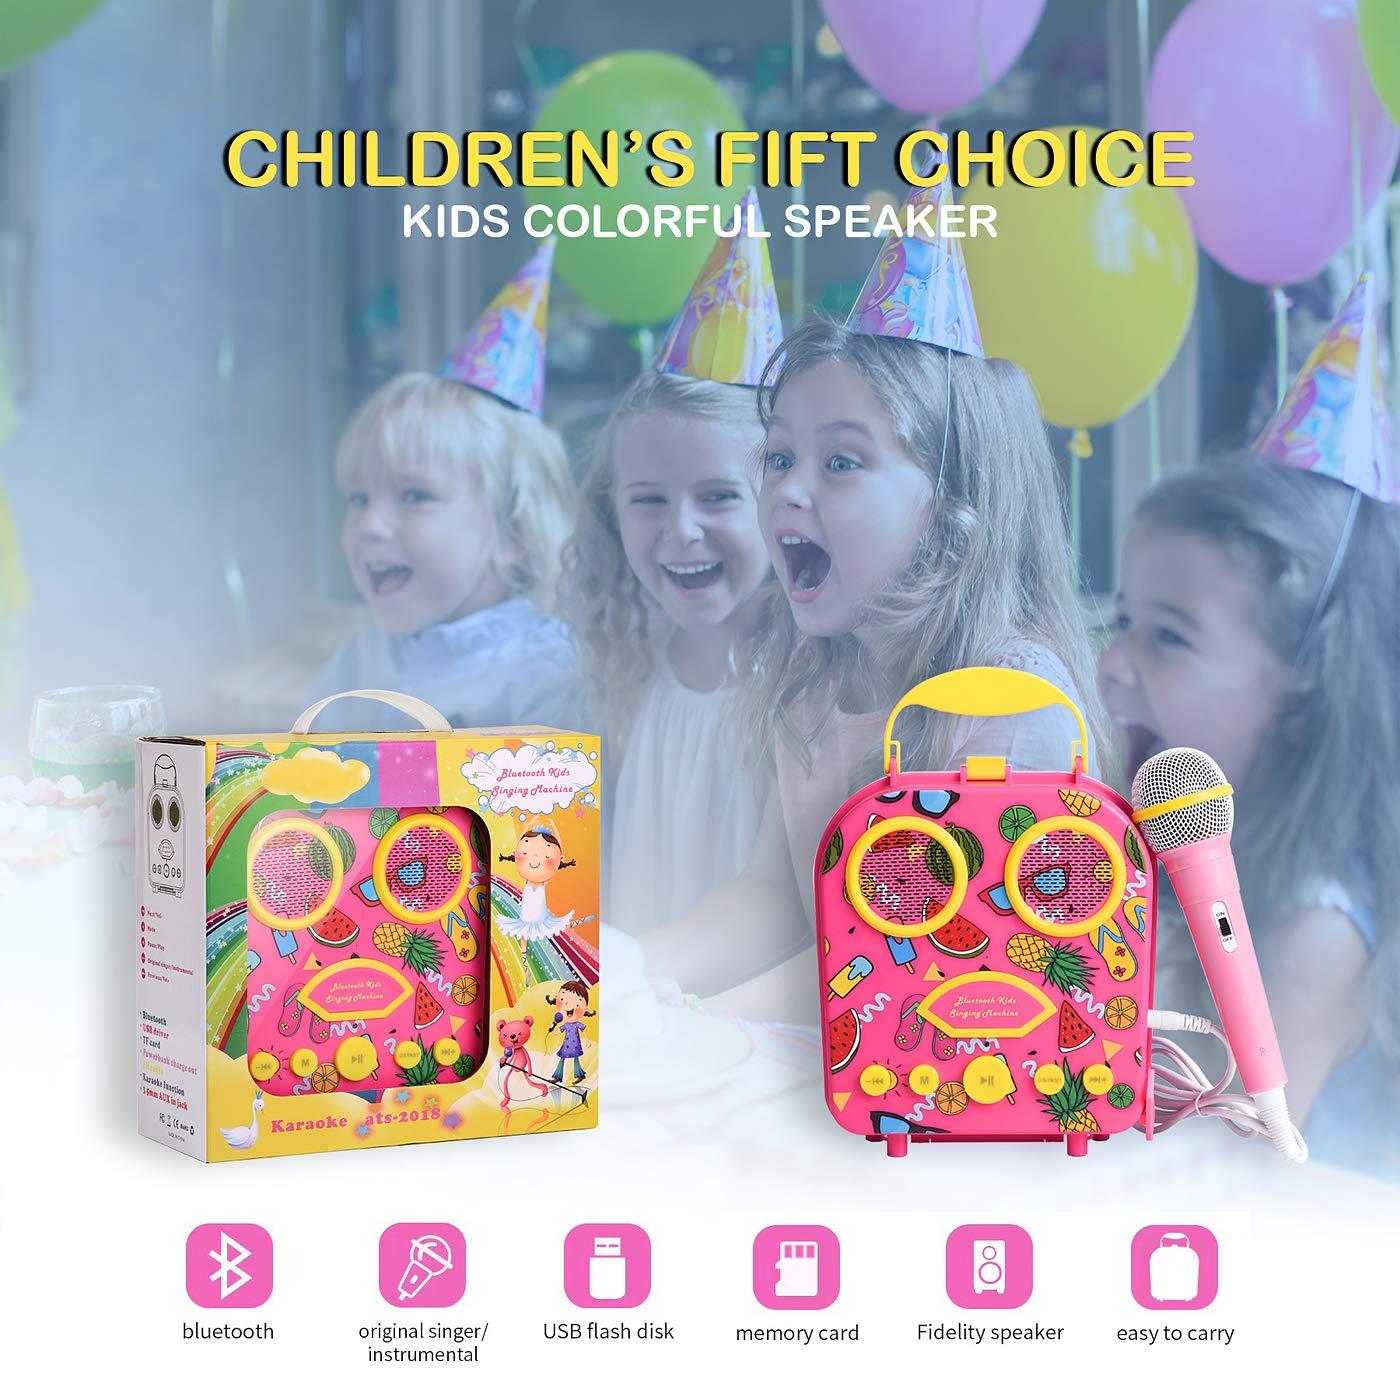 Bluetooth Speaker Children's Karaoke Speaker Portable Microphone Beach Handbag Karaoke Bluetooth Speaker Wireless Cartoon Speaker for Kids for Indoor Outdoor Travel Activities with Microphone (Pink) by HowQ (Image #6)